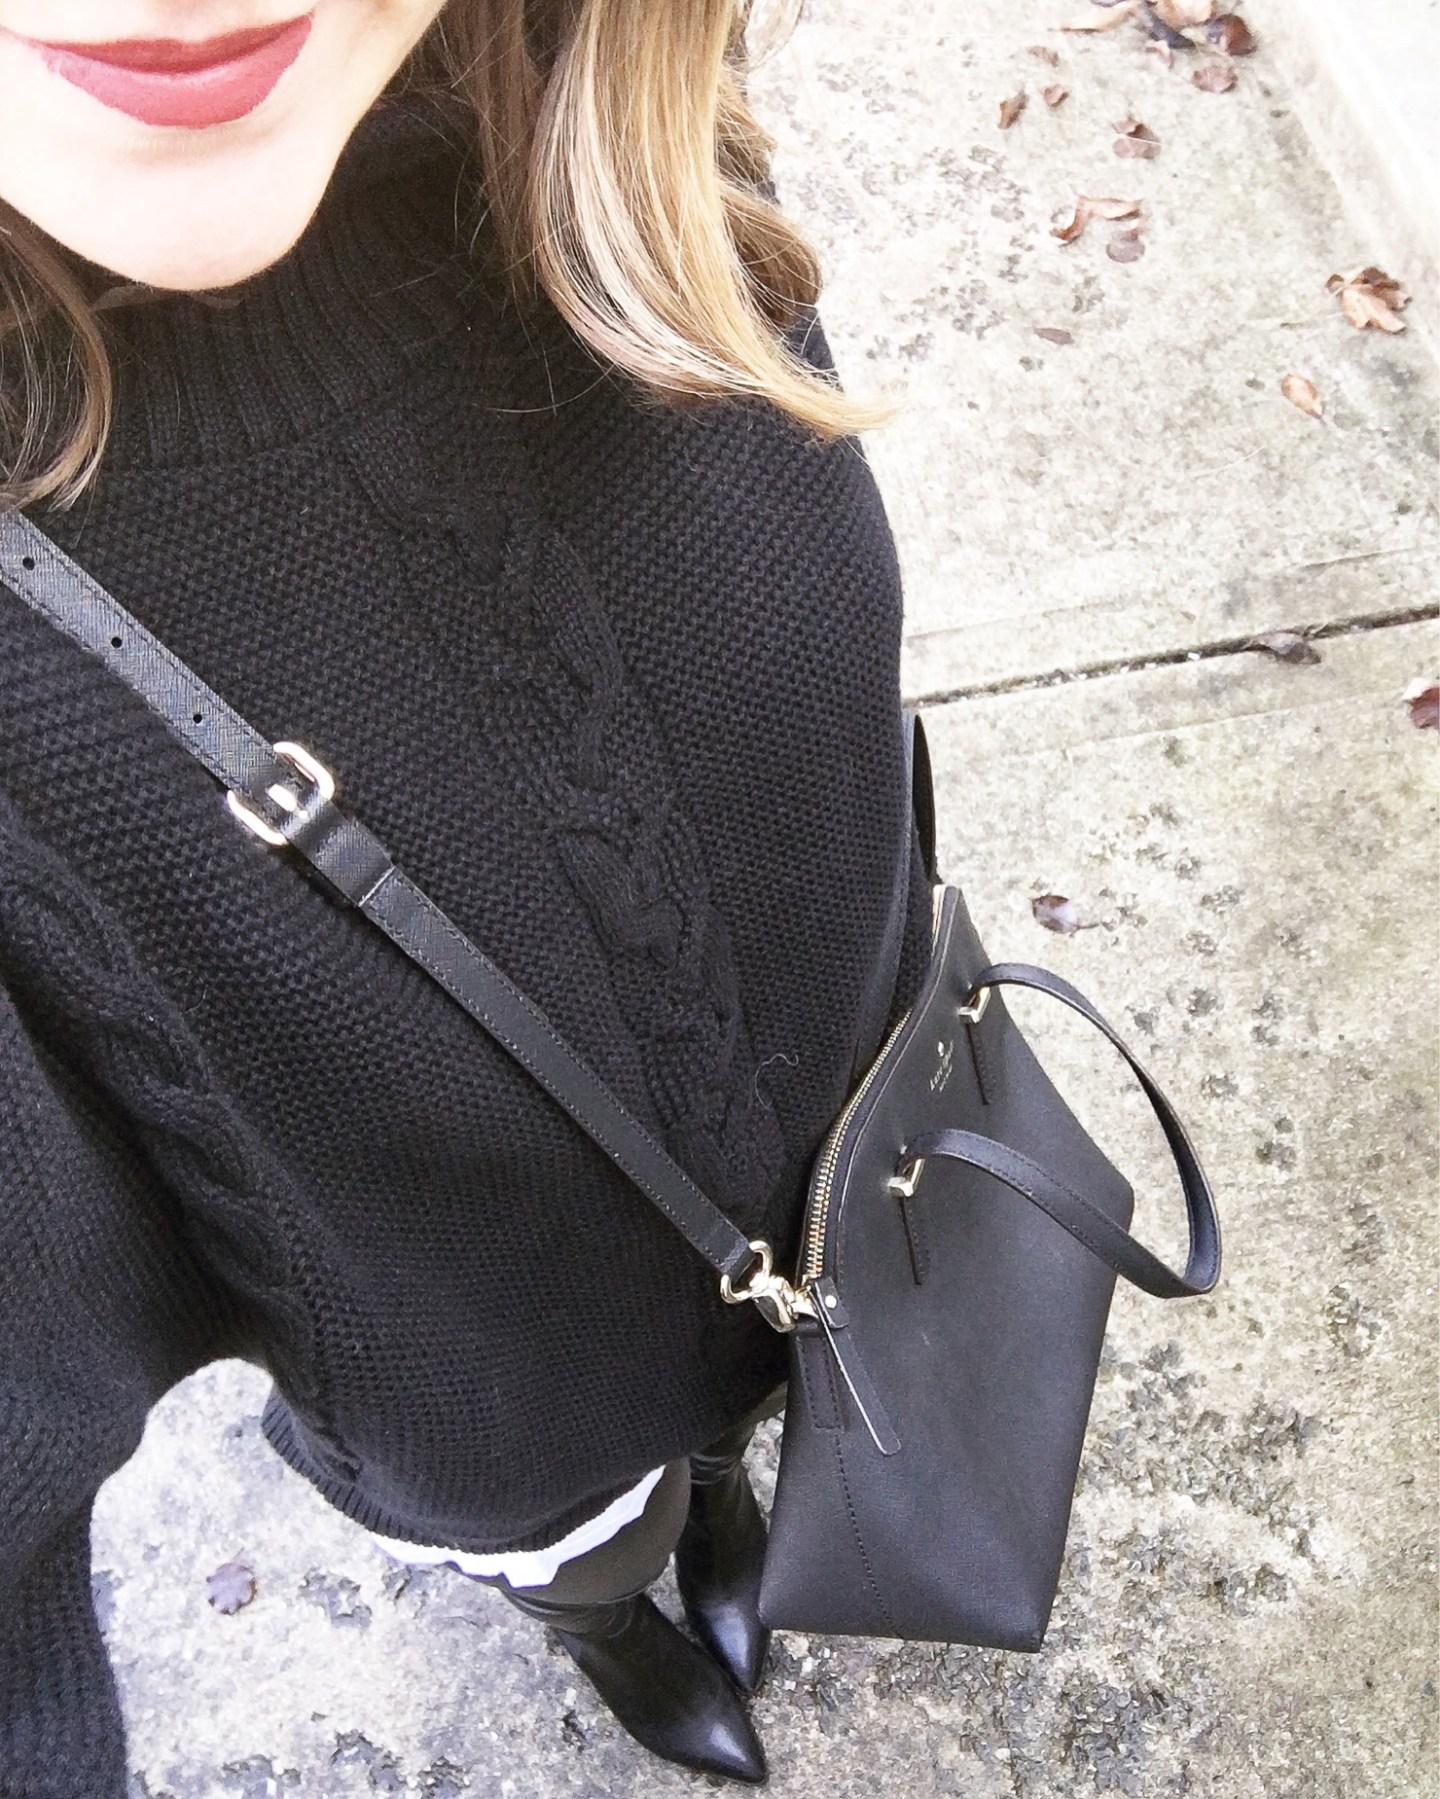 instagram-monochromatic-black-outfit-leather-leggings-kate-spade-cedar-maise